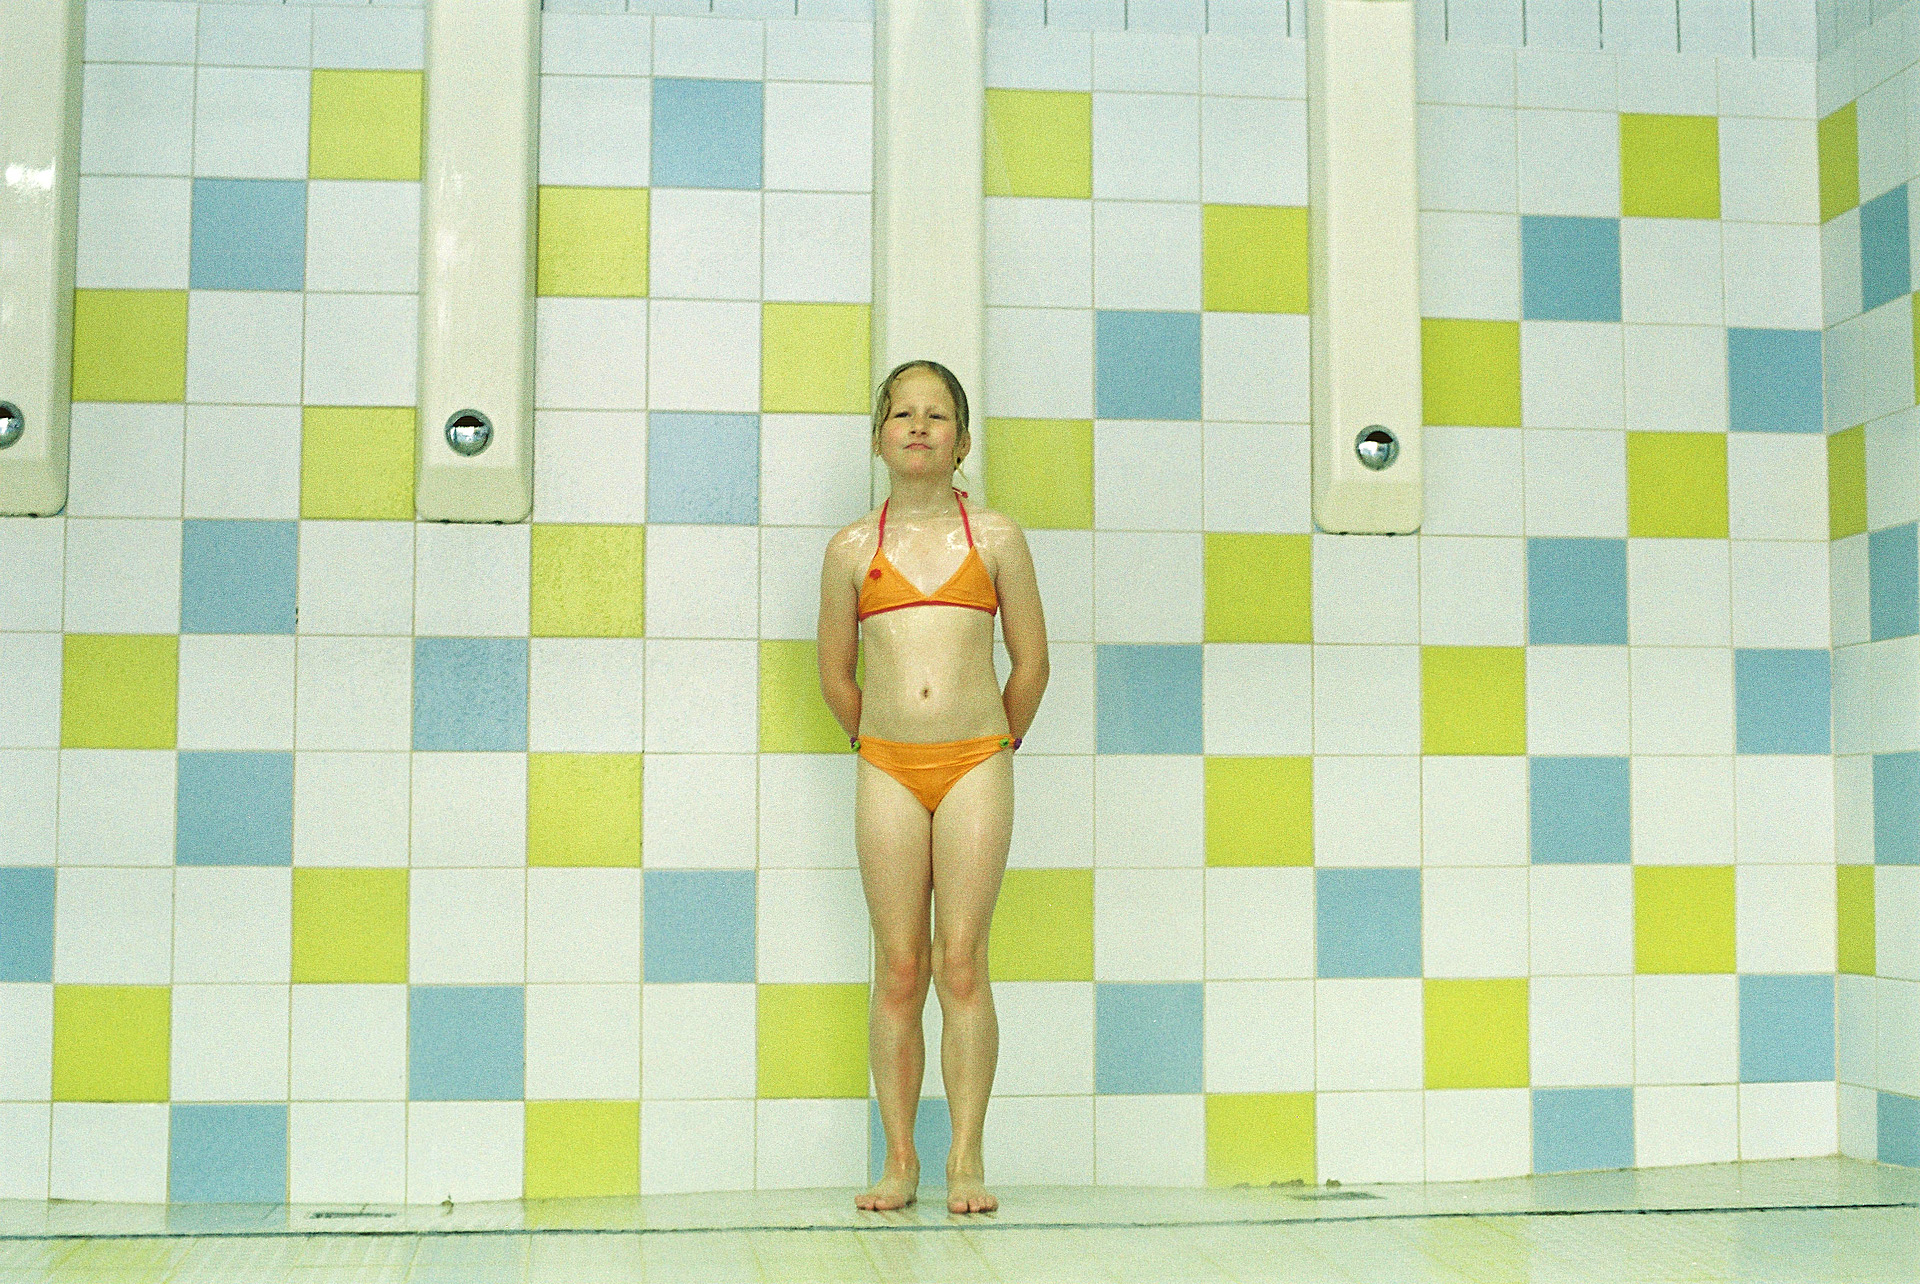 Swimming pool - Els Matthysen